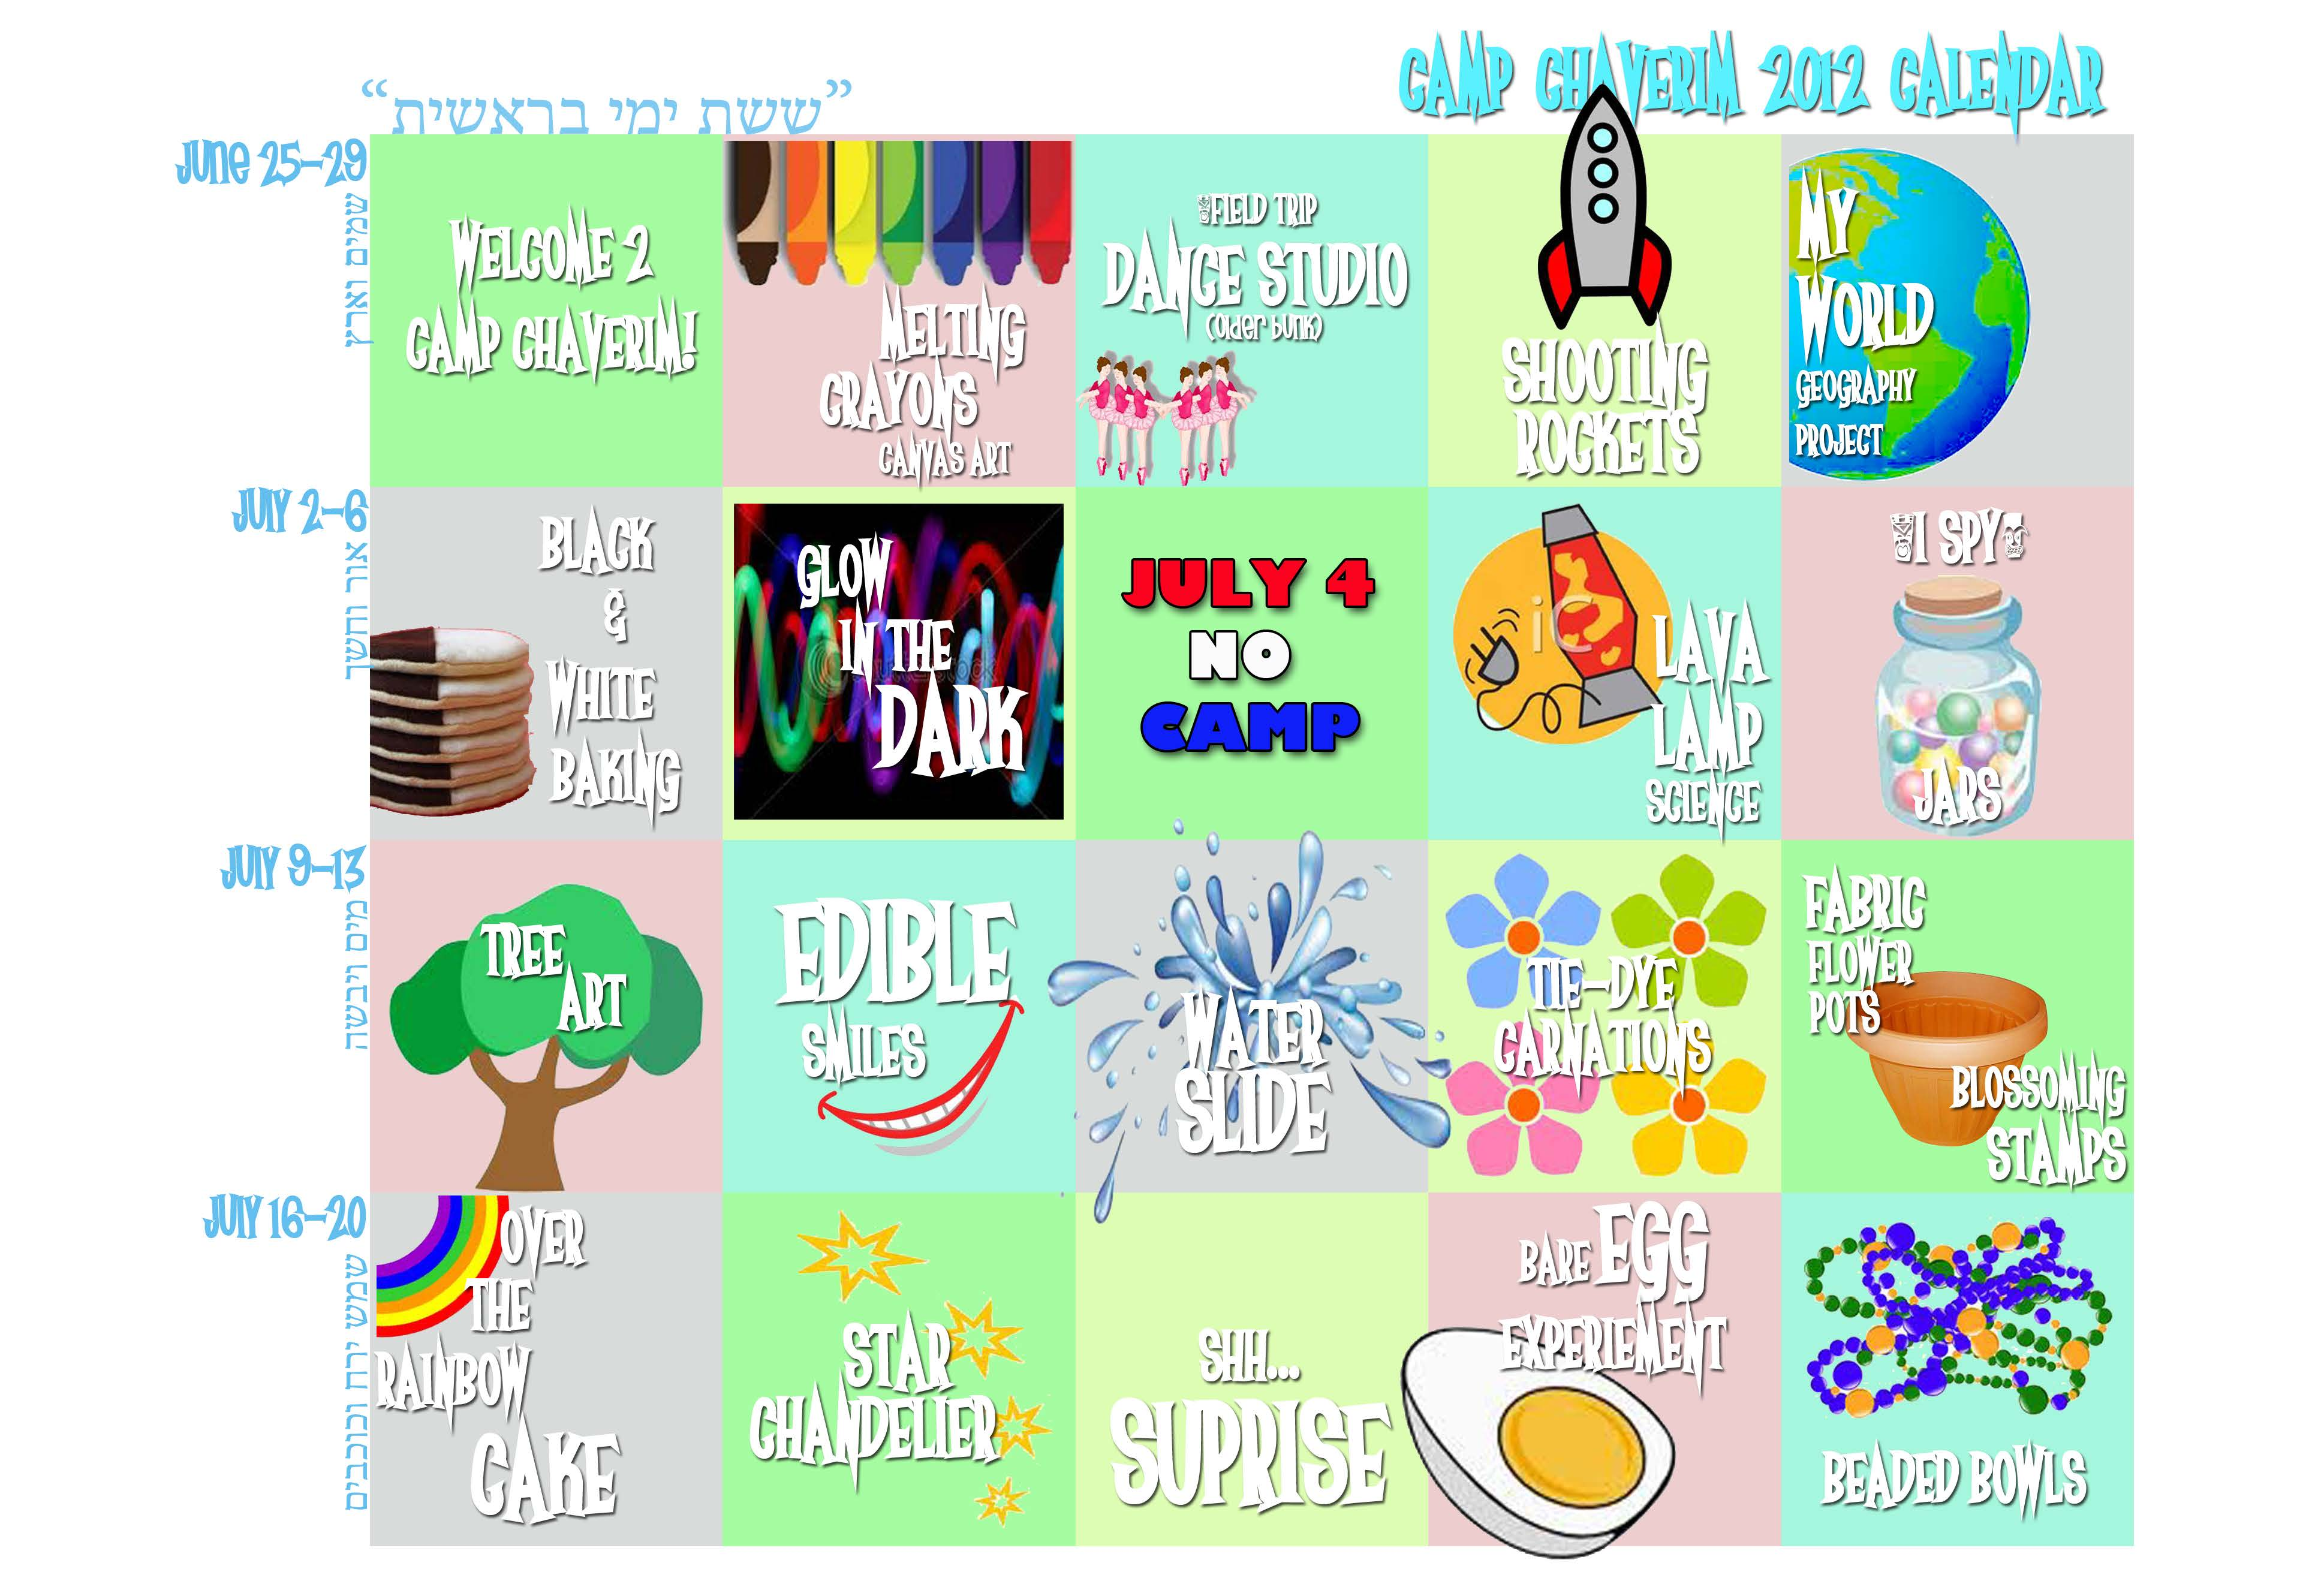 camp_calendar6-7-2012